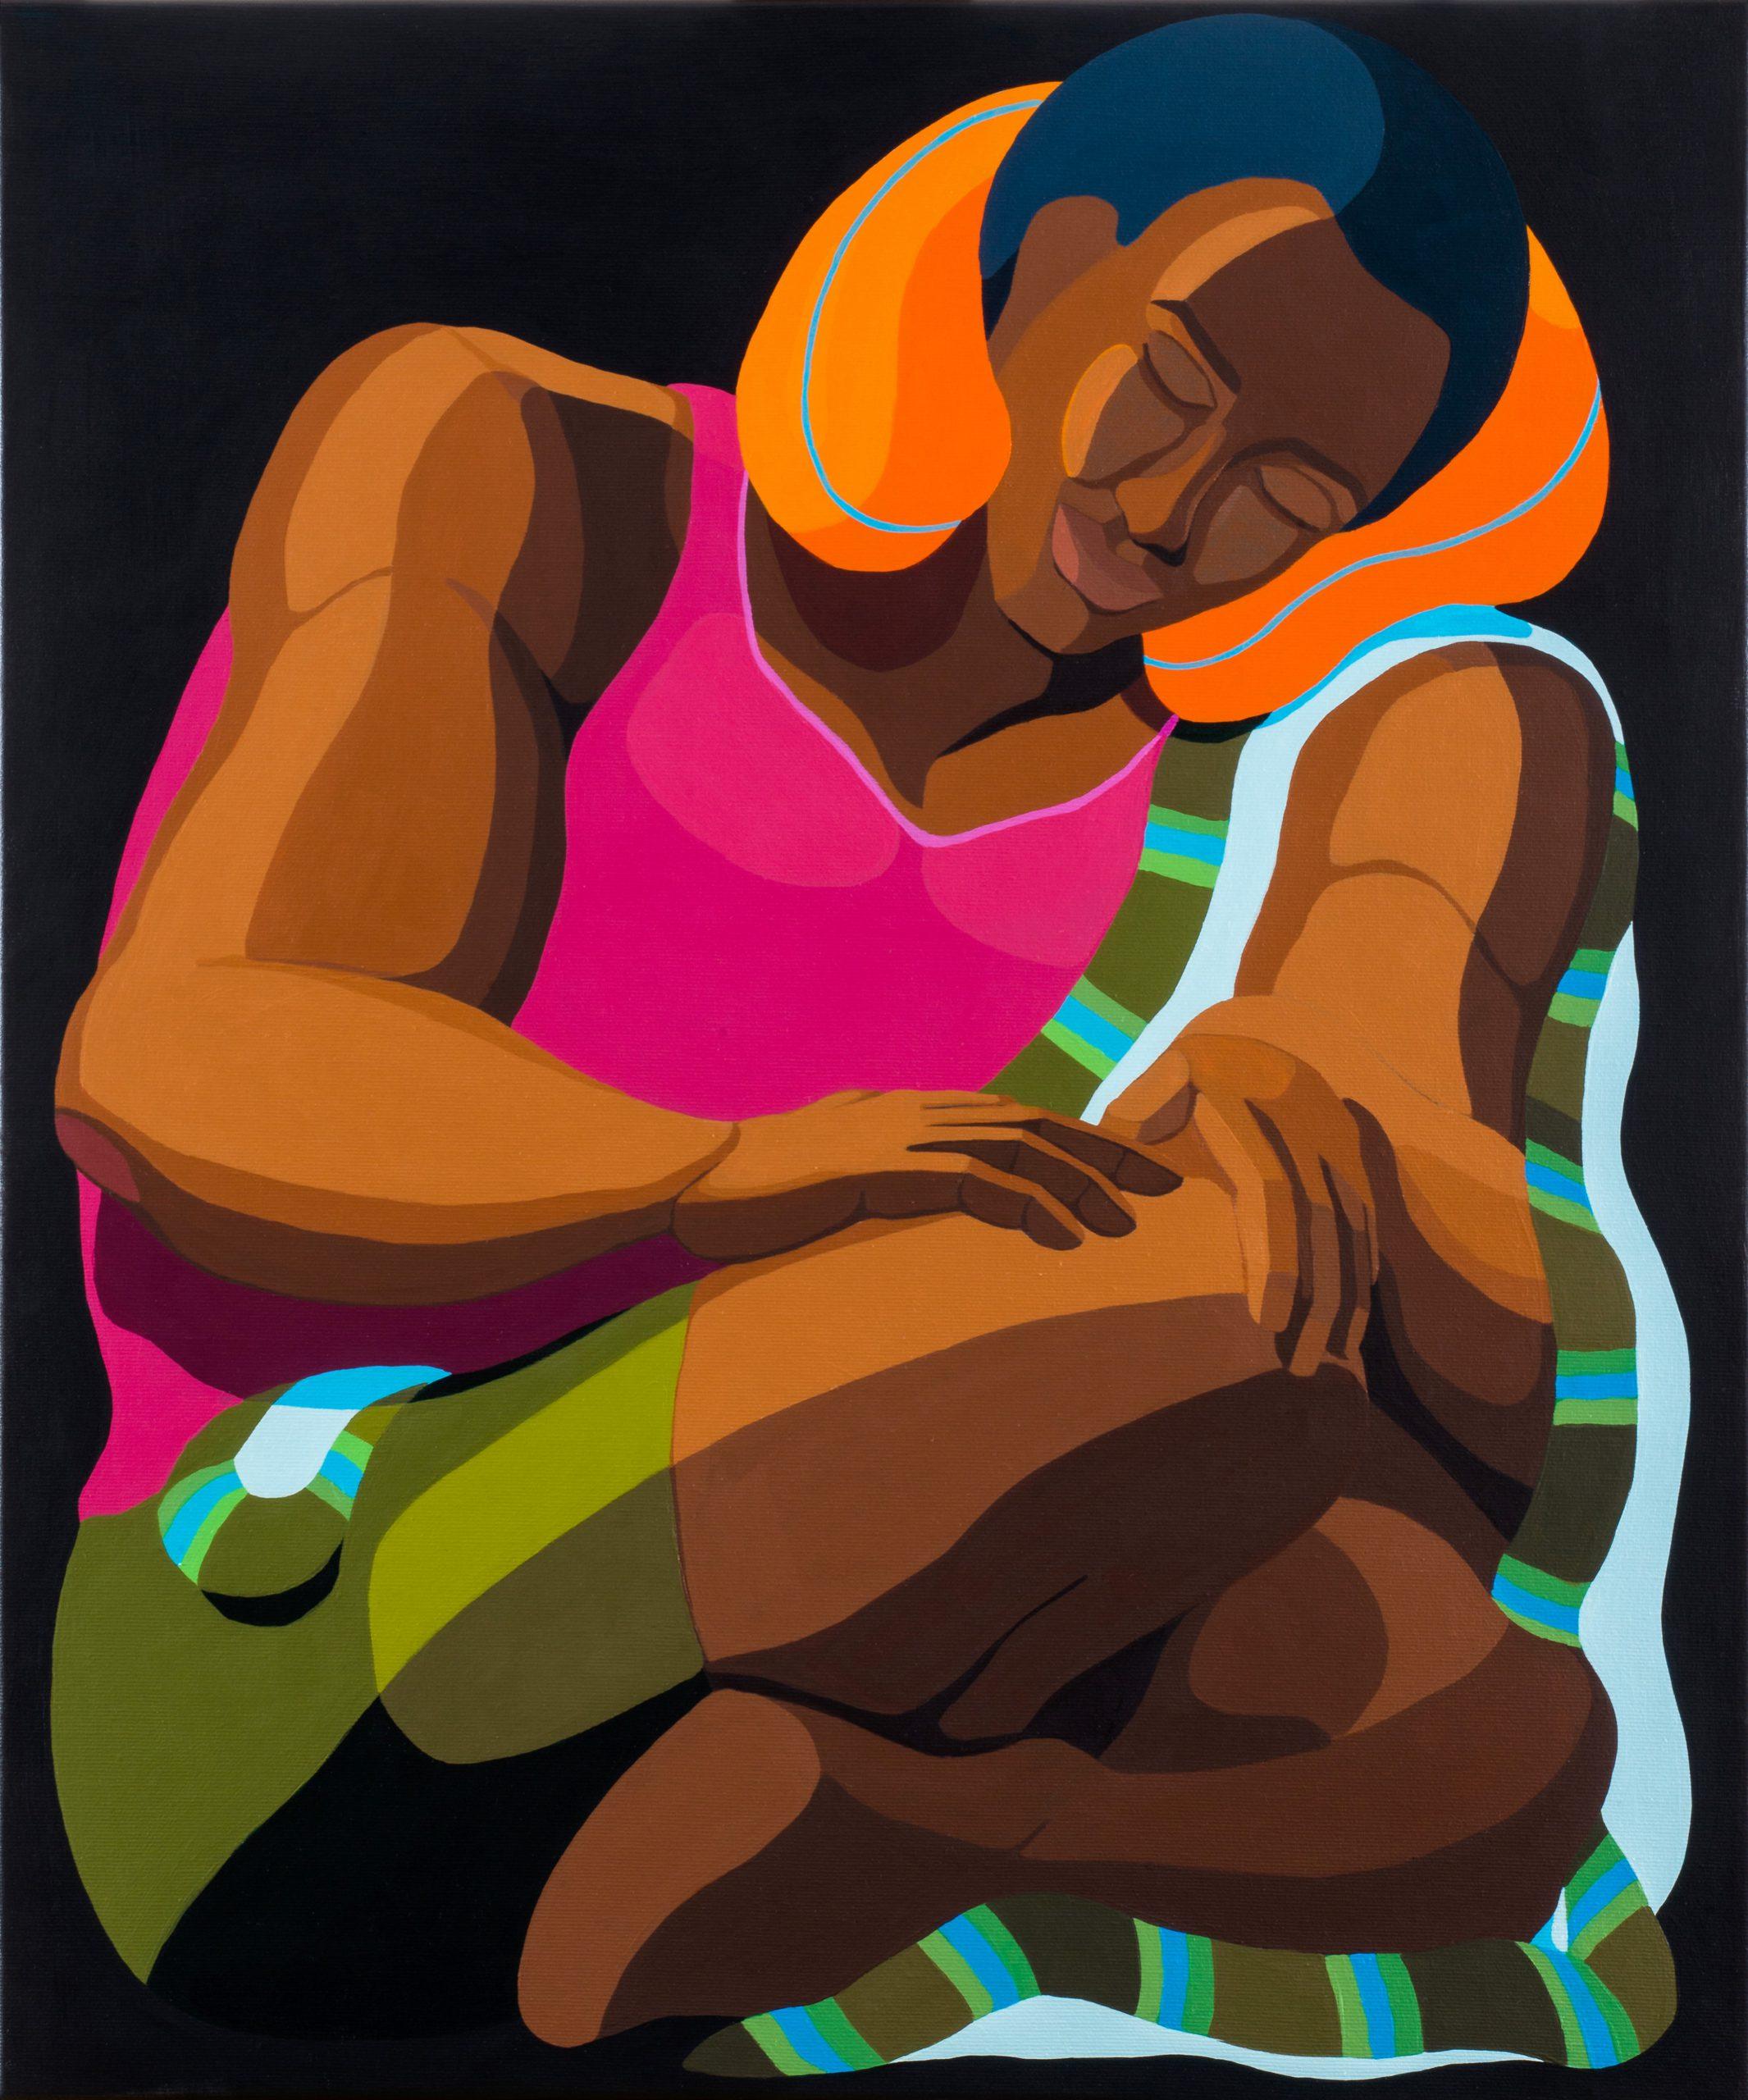 Nirit Takele, Lean on Travel pillow, 60x50 cm, acrylic on canvas, 2020